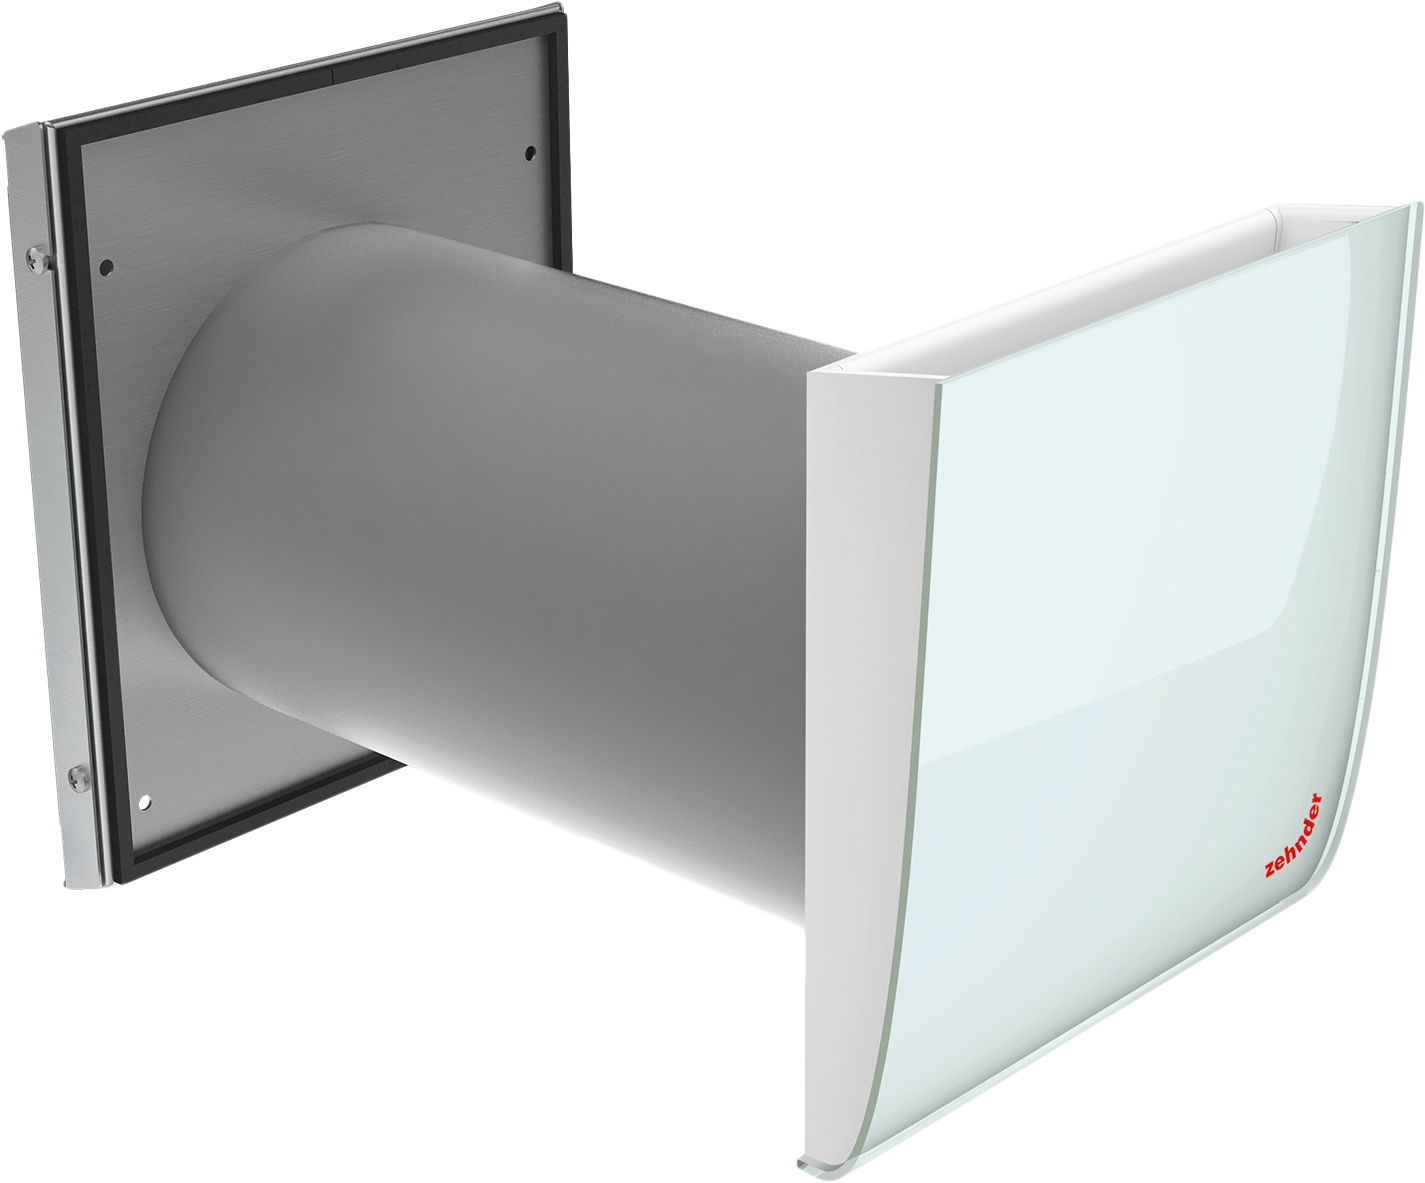 paarweise dezentrale l ftung la zehnder mit dem flur als berstr melement. Black Bedroom Furniture Sets. Home Design Ideas